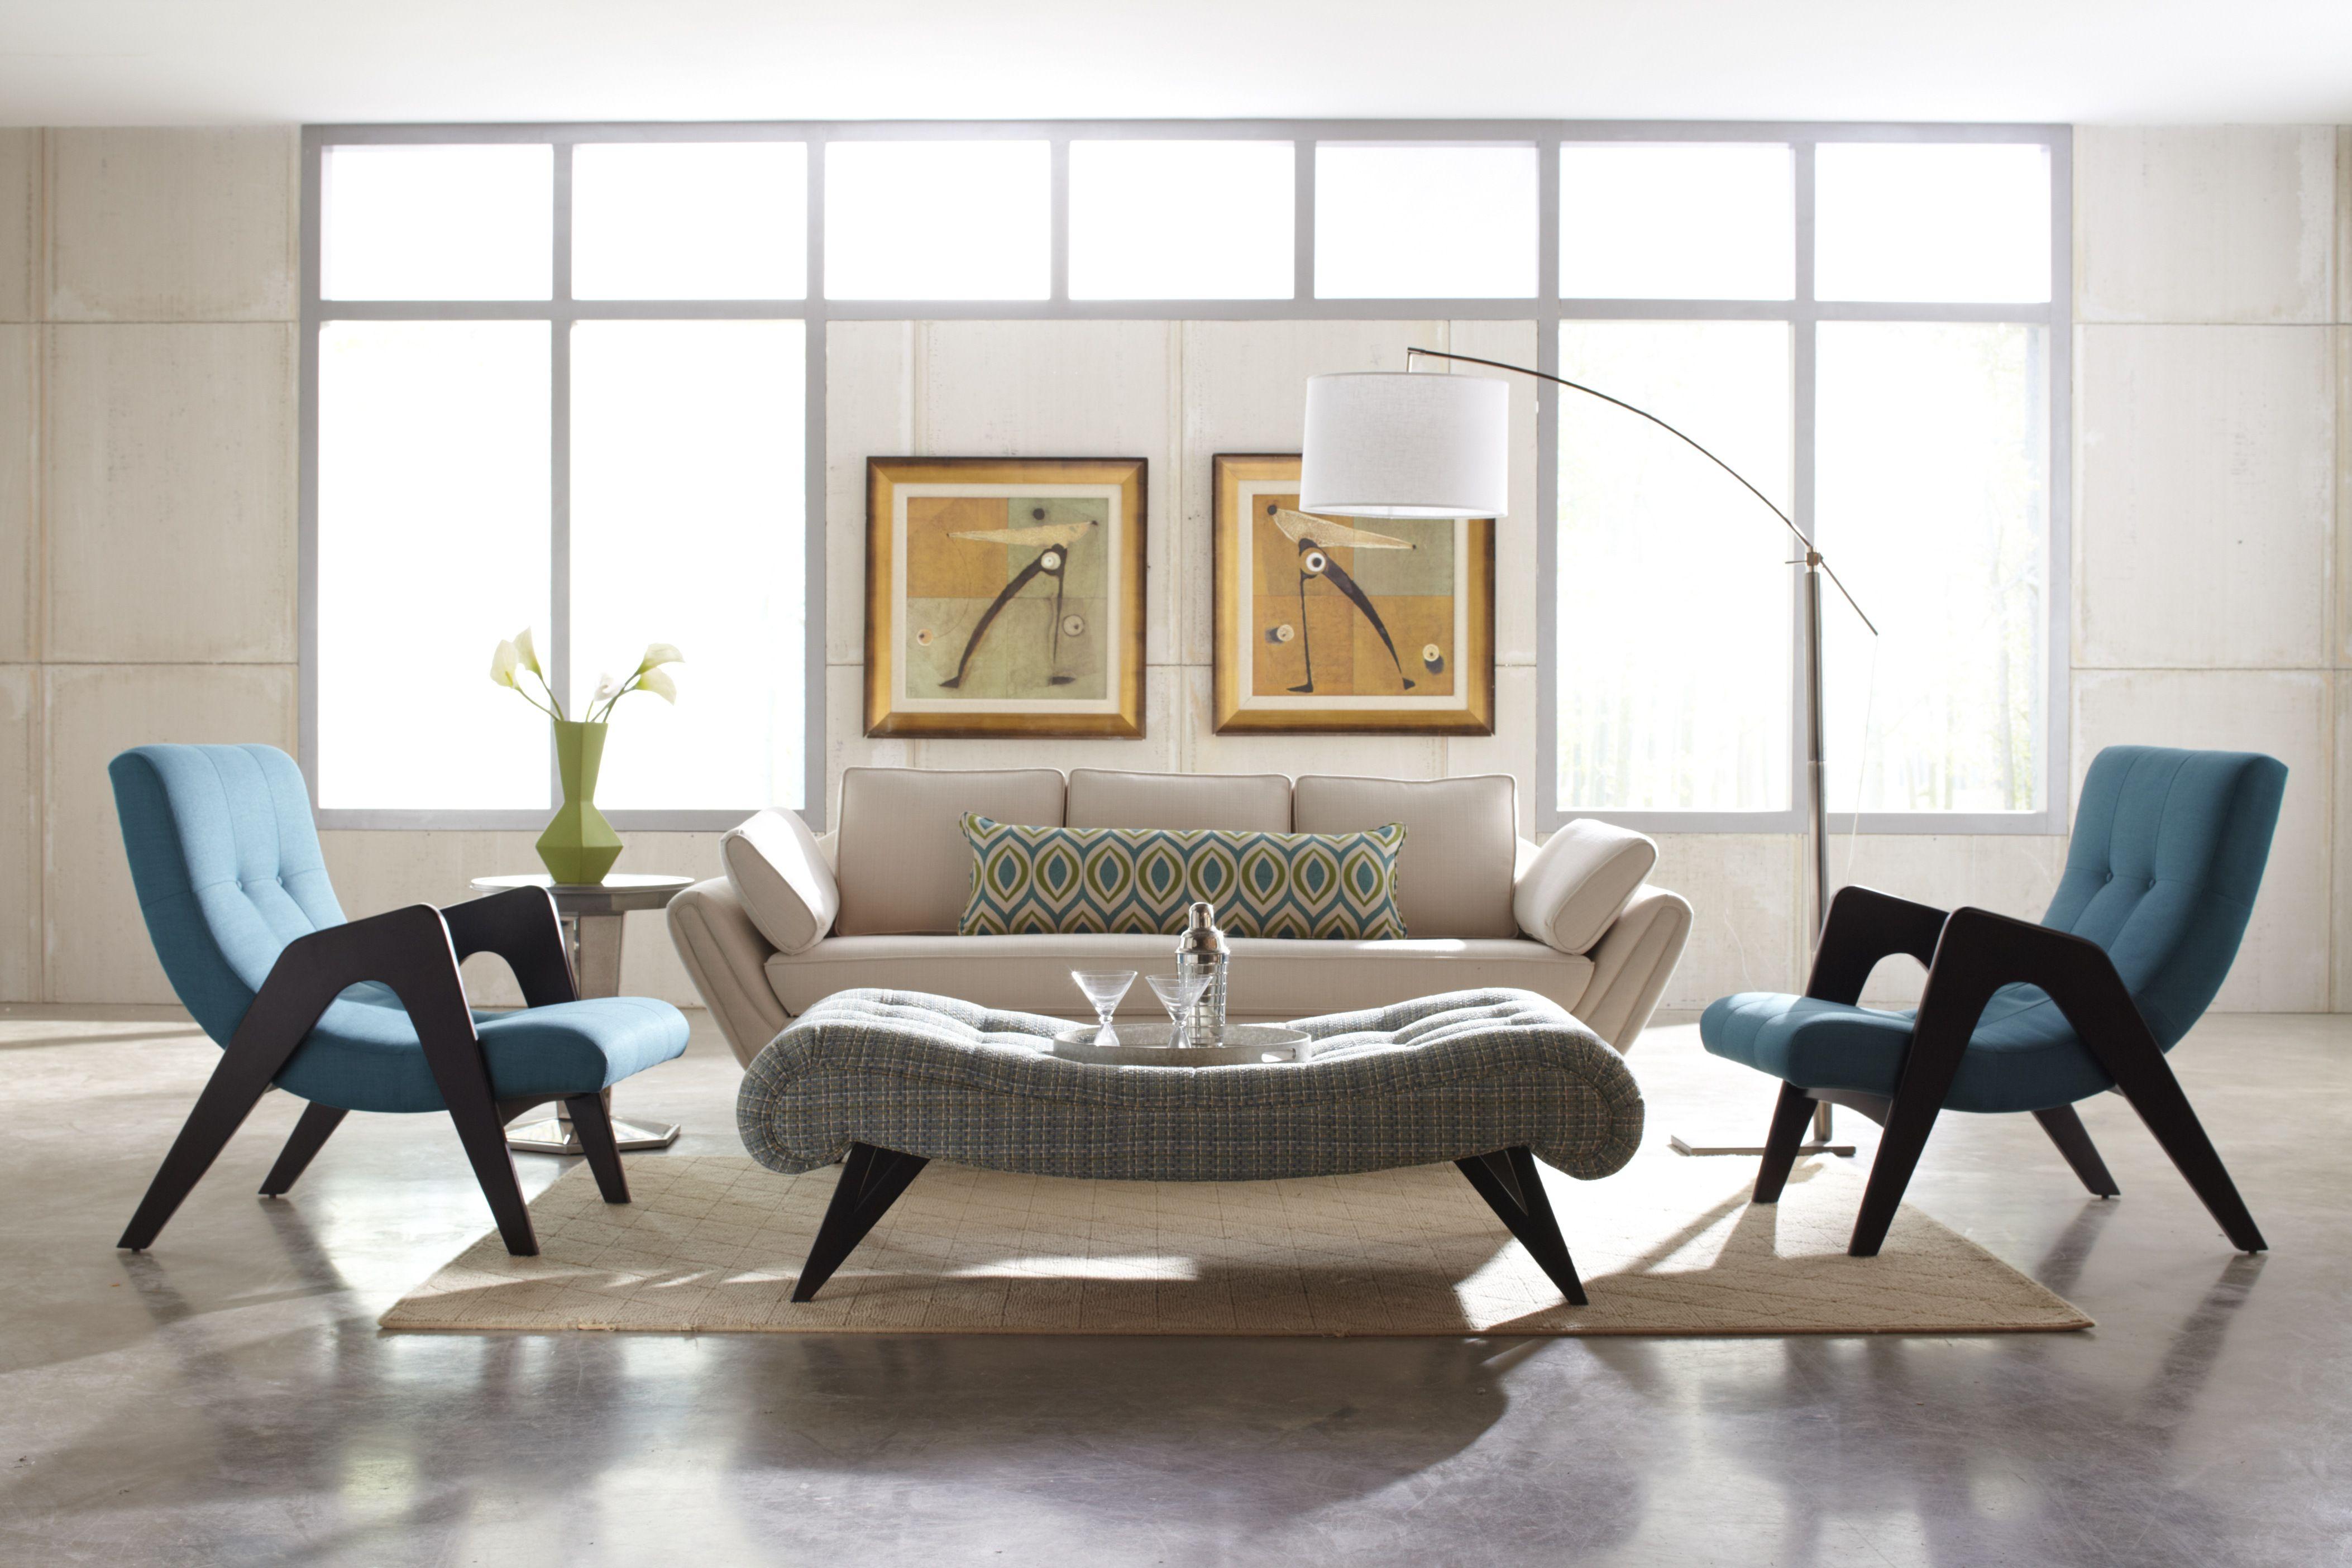 mid century modern living room New House Pinterest Mid century